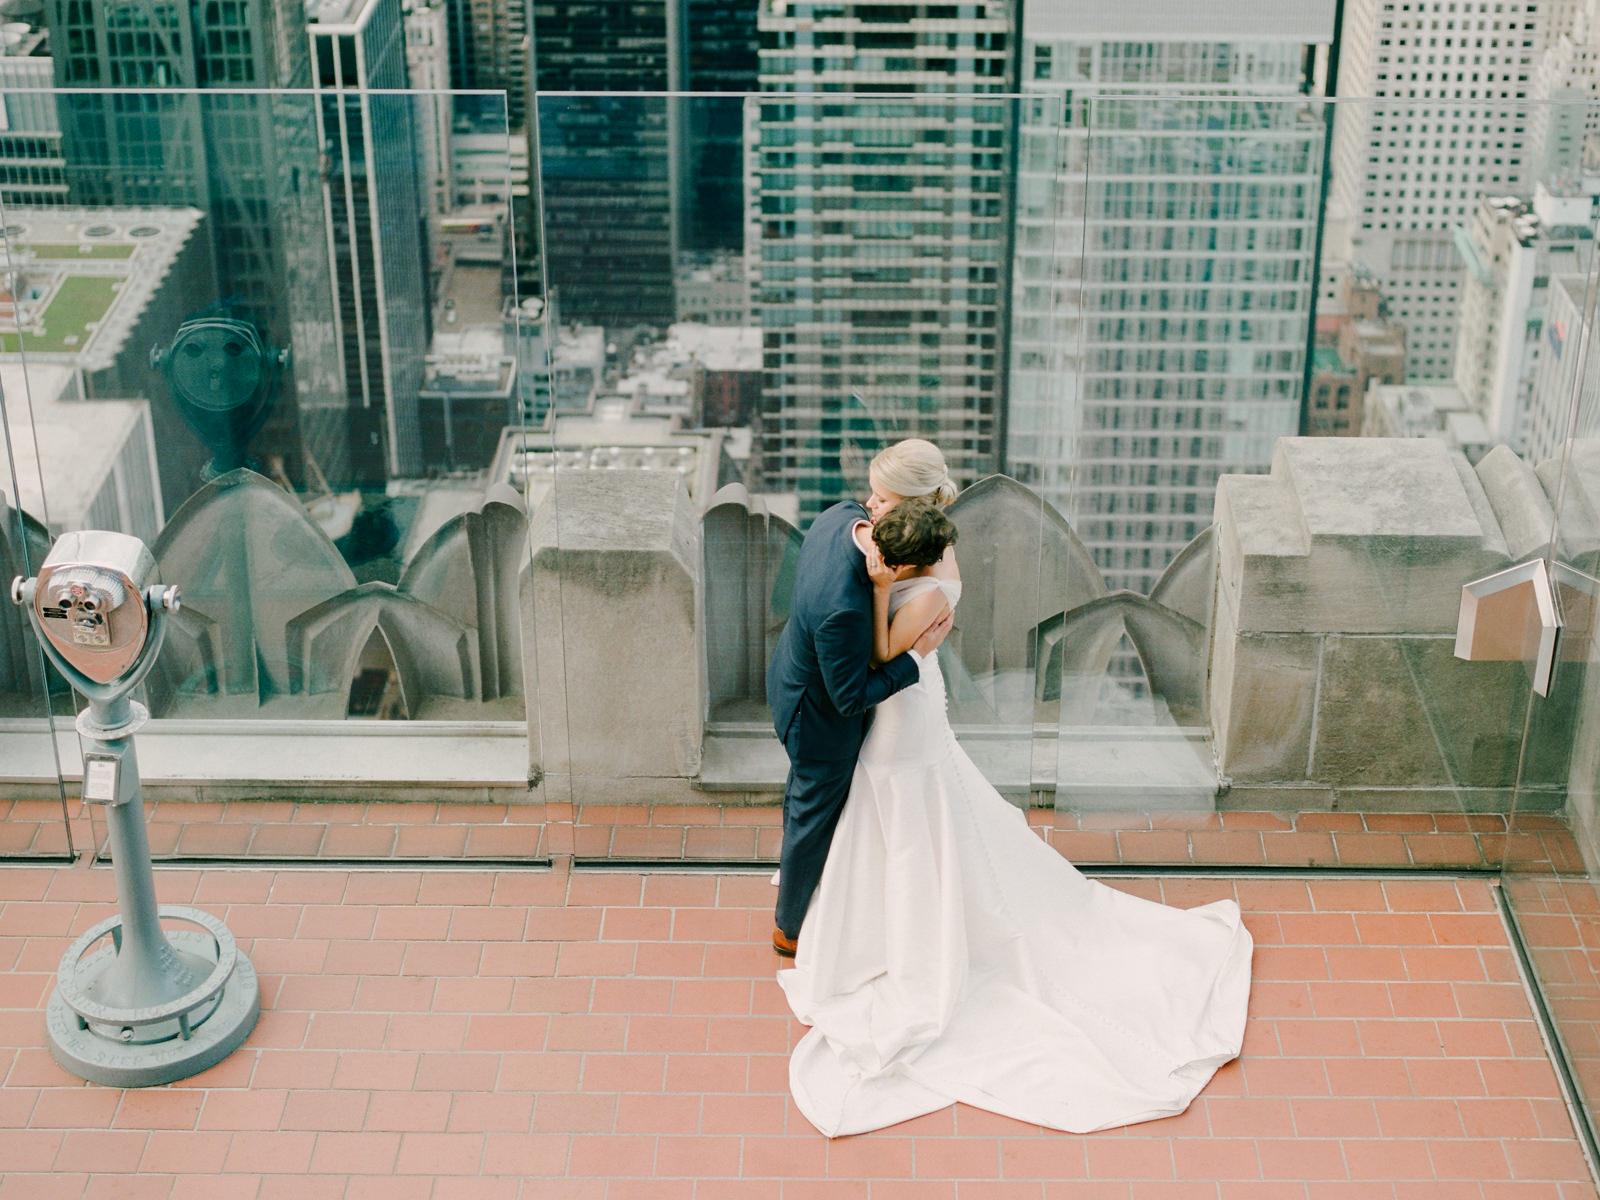 Intimate-NYC_wedding_ by Tanya Isaeva-166.jpg